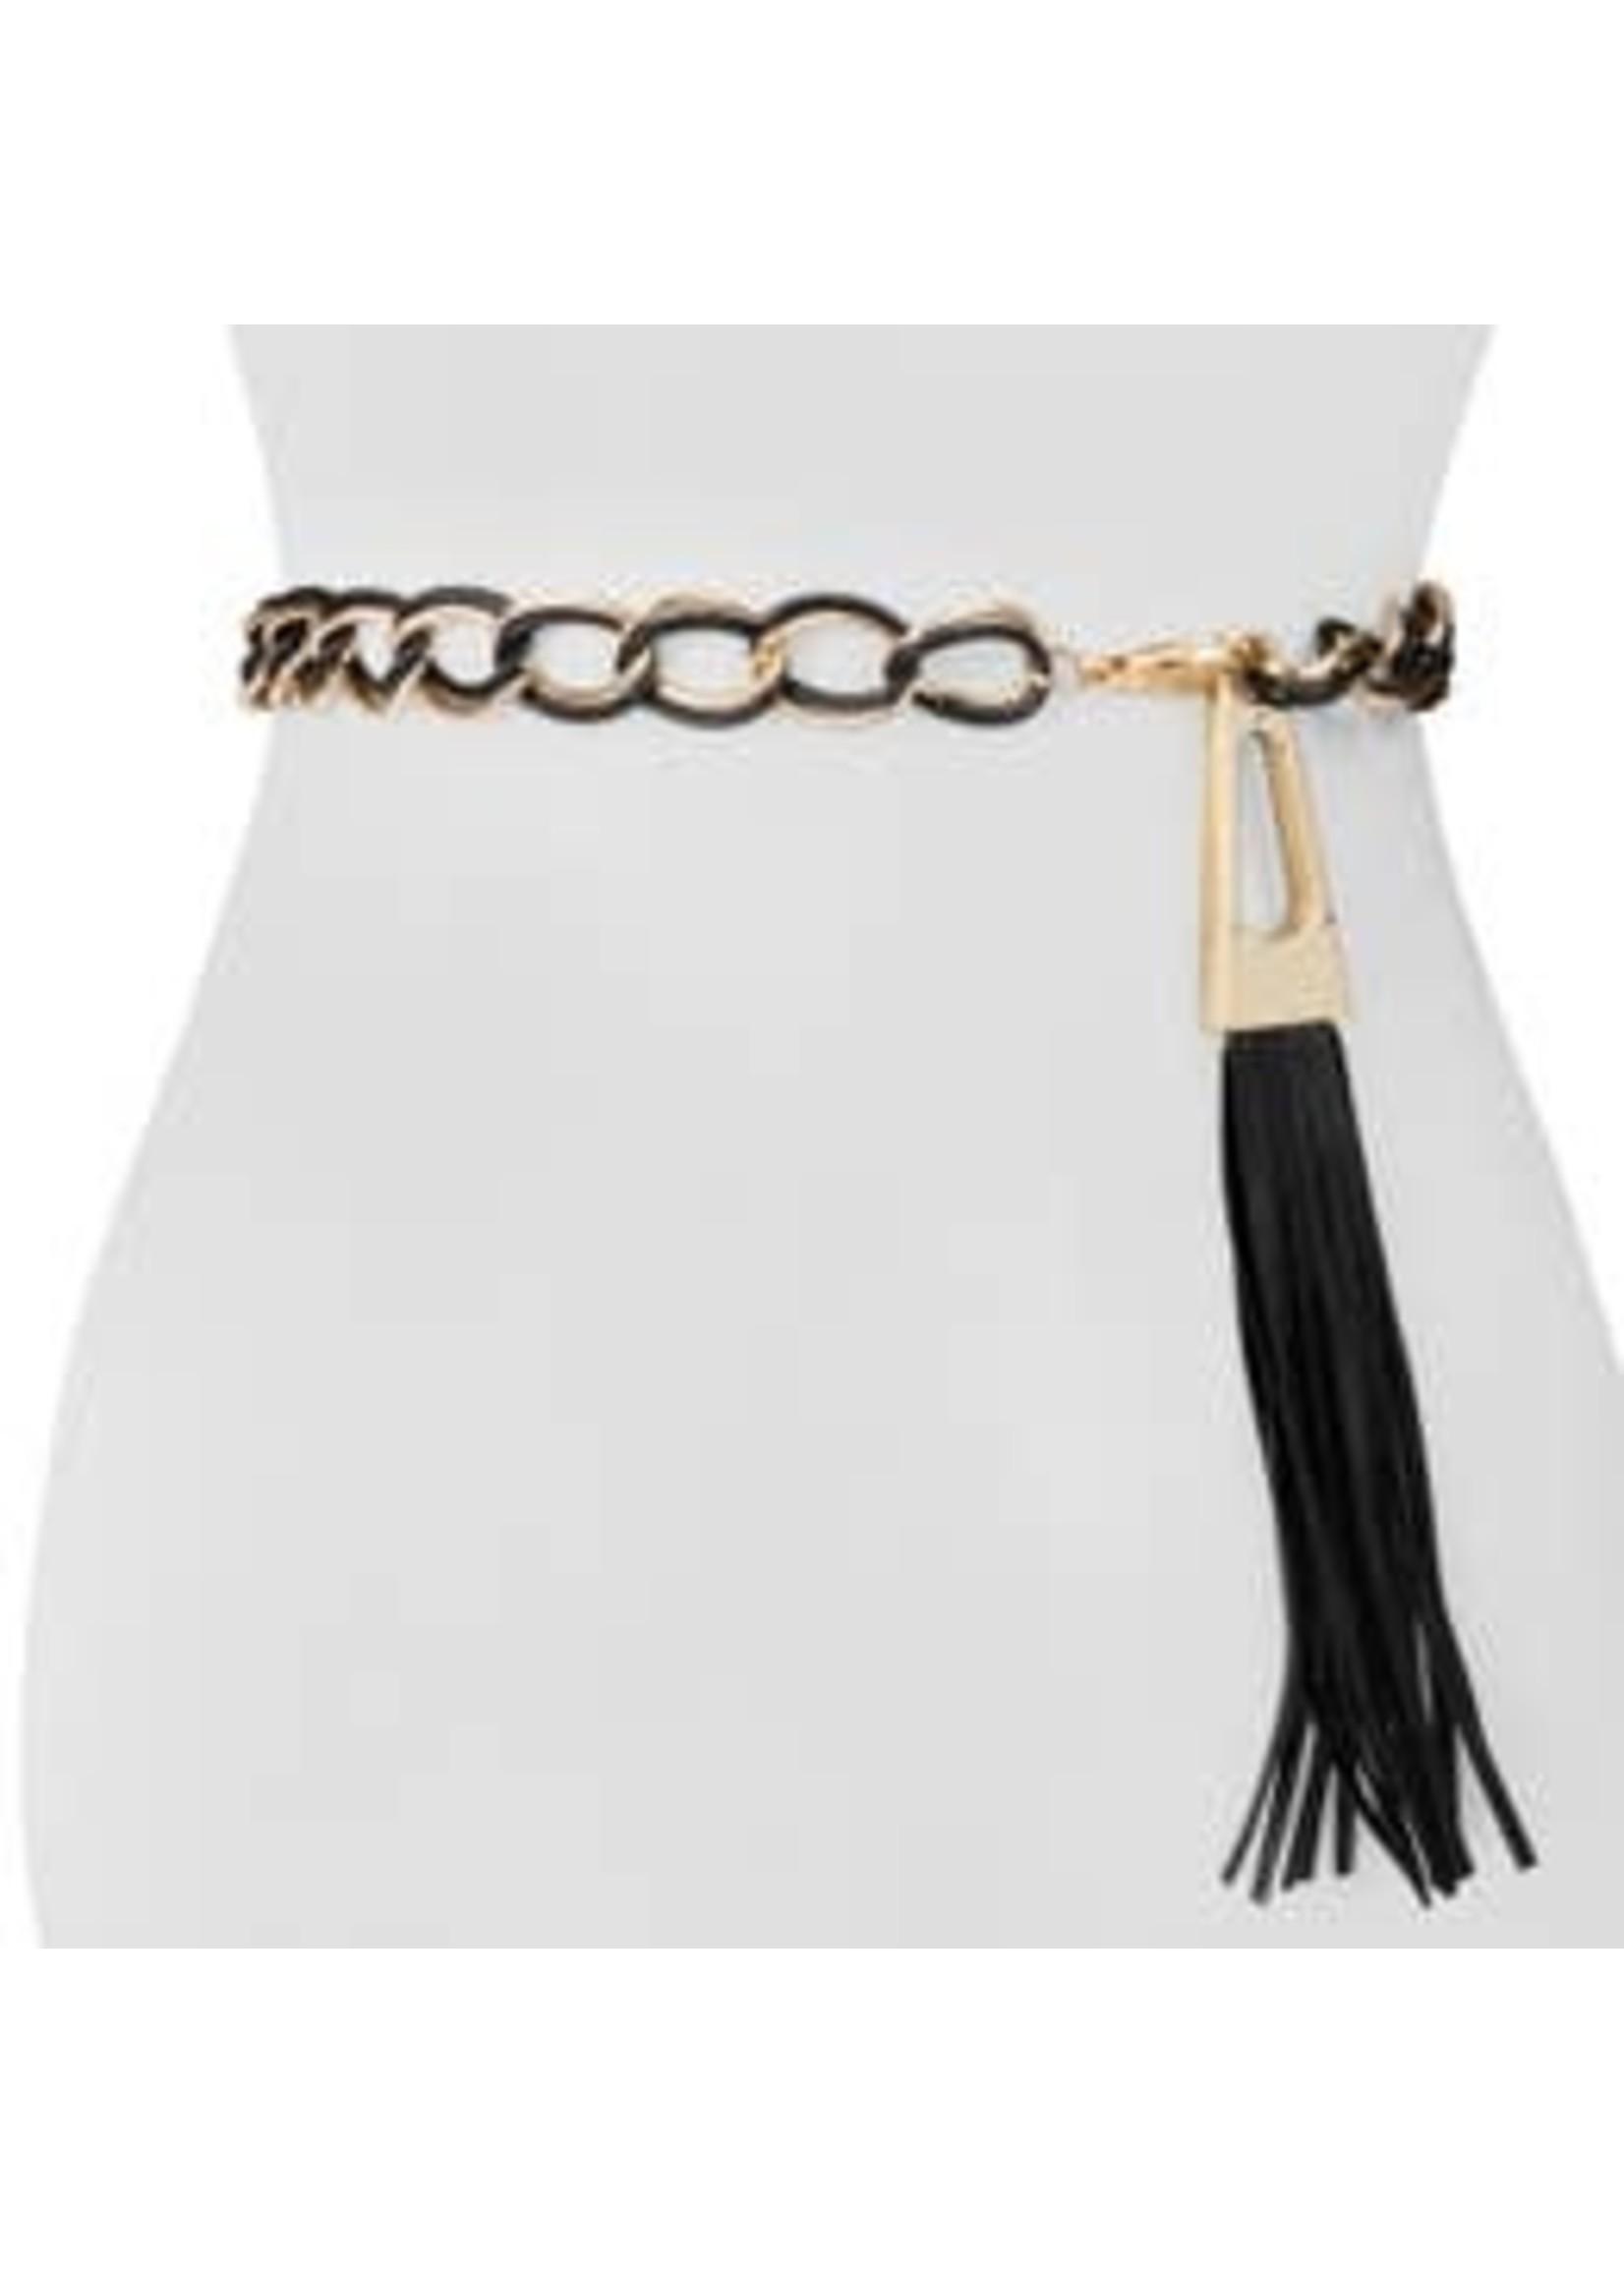 Blk & Gld Chain Leather Tassel Belt